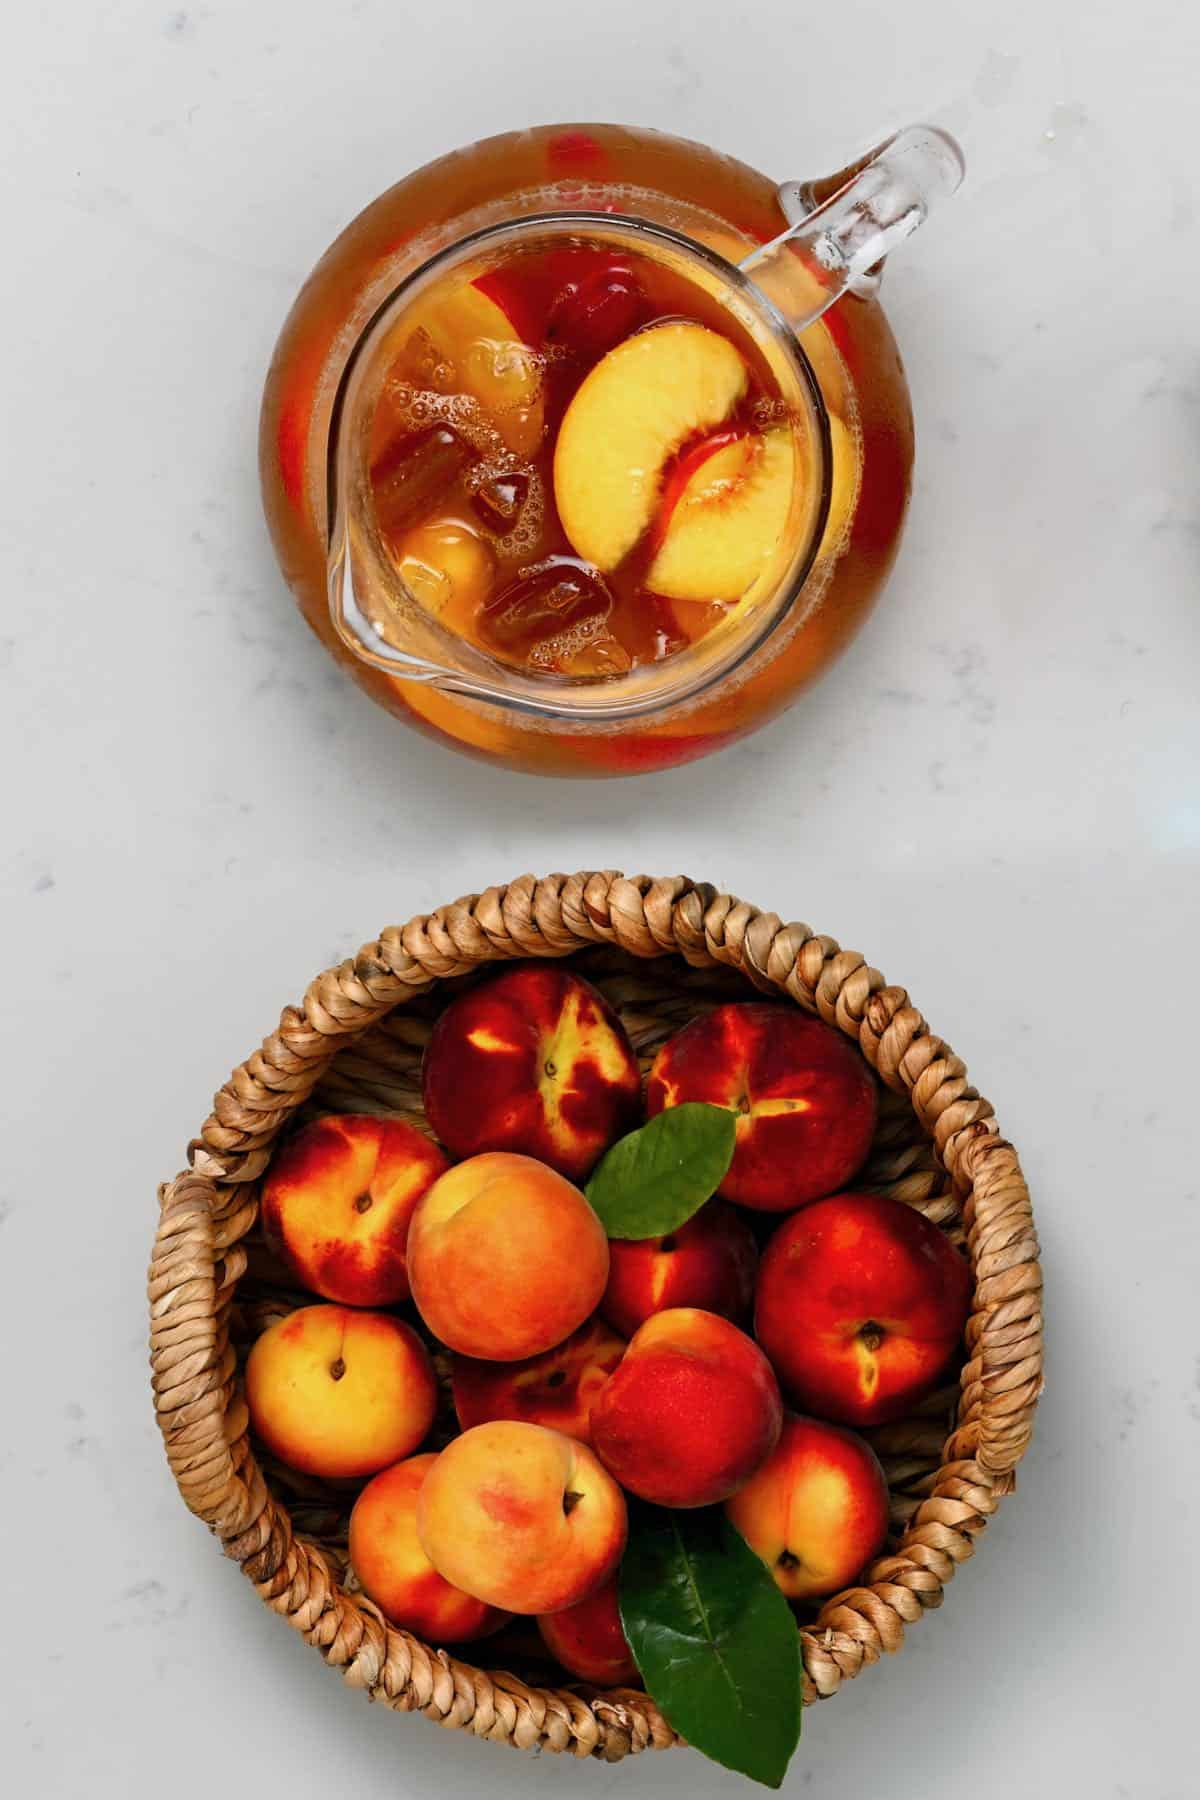 Peach ice tea and peaches